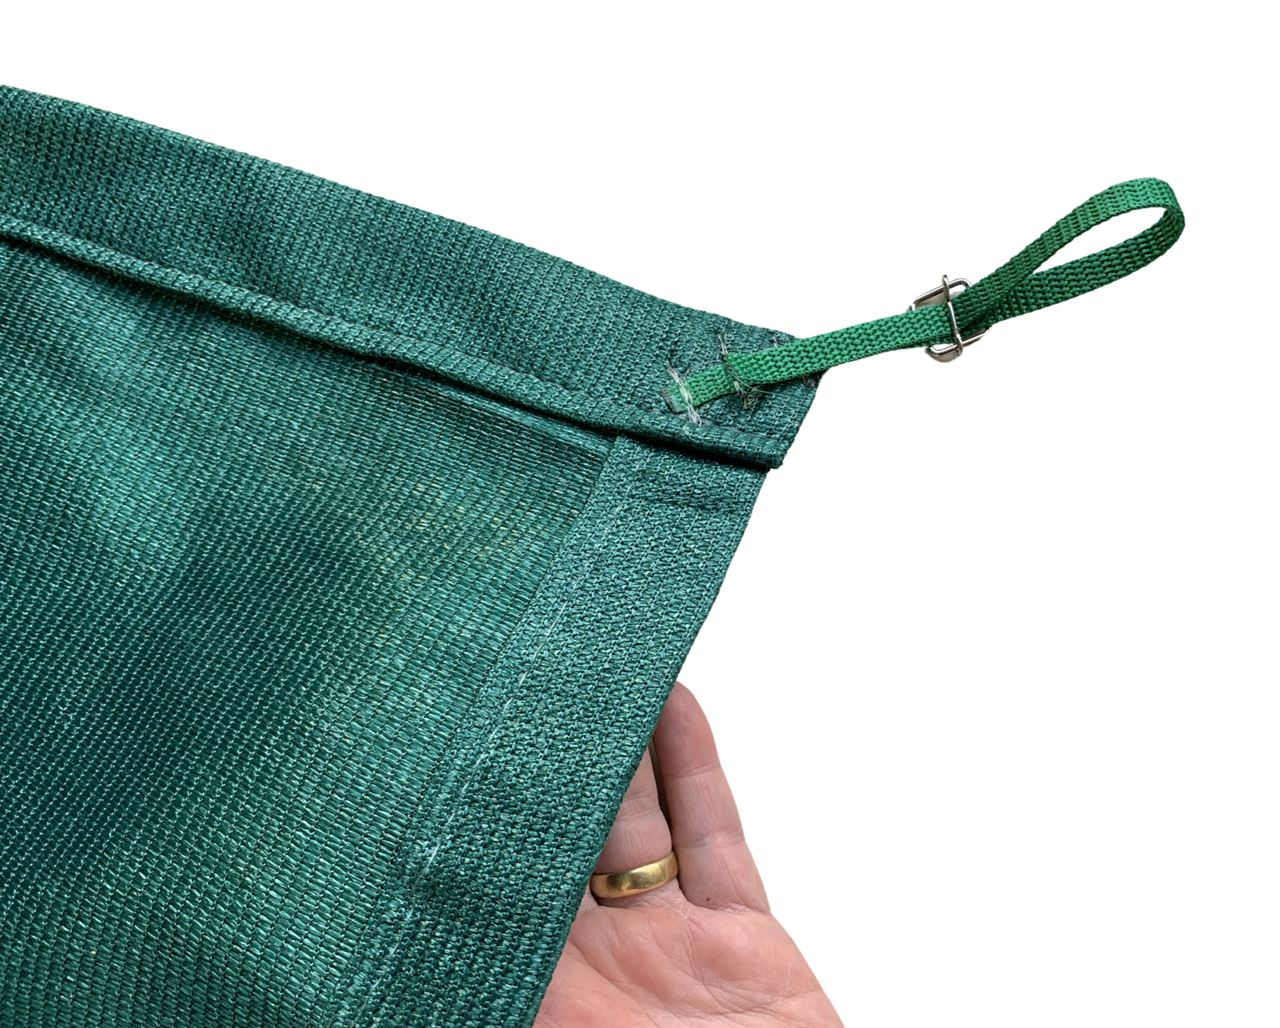 Tela de Sombreamento 90% Verde com Esticadores - Largura: 2,5 Metros